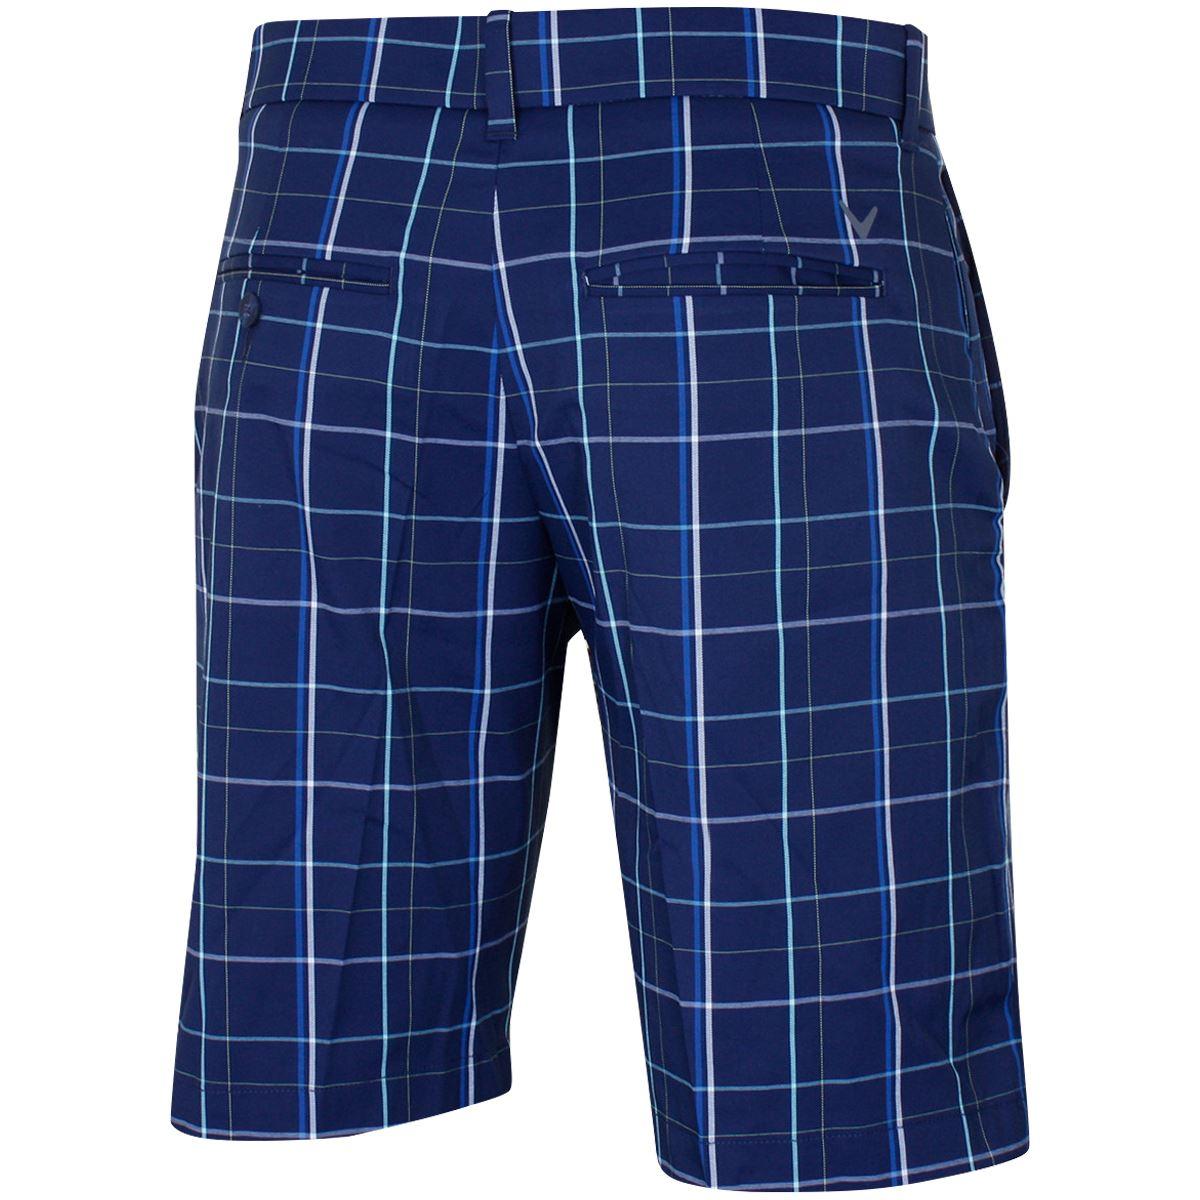 Callaway-Golf-Fashion-Plaid-Flat-Front-Mens-Stretch-Golf-Shorts thumbnail 3